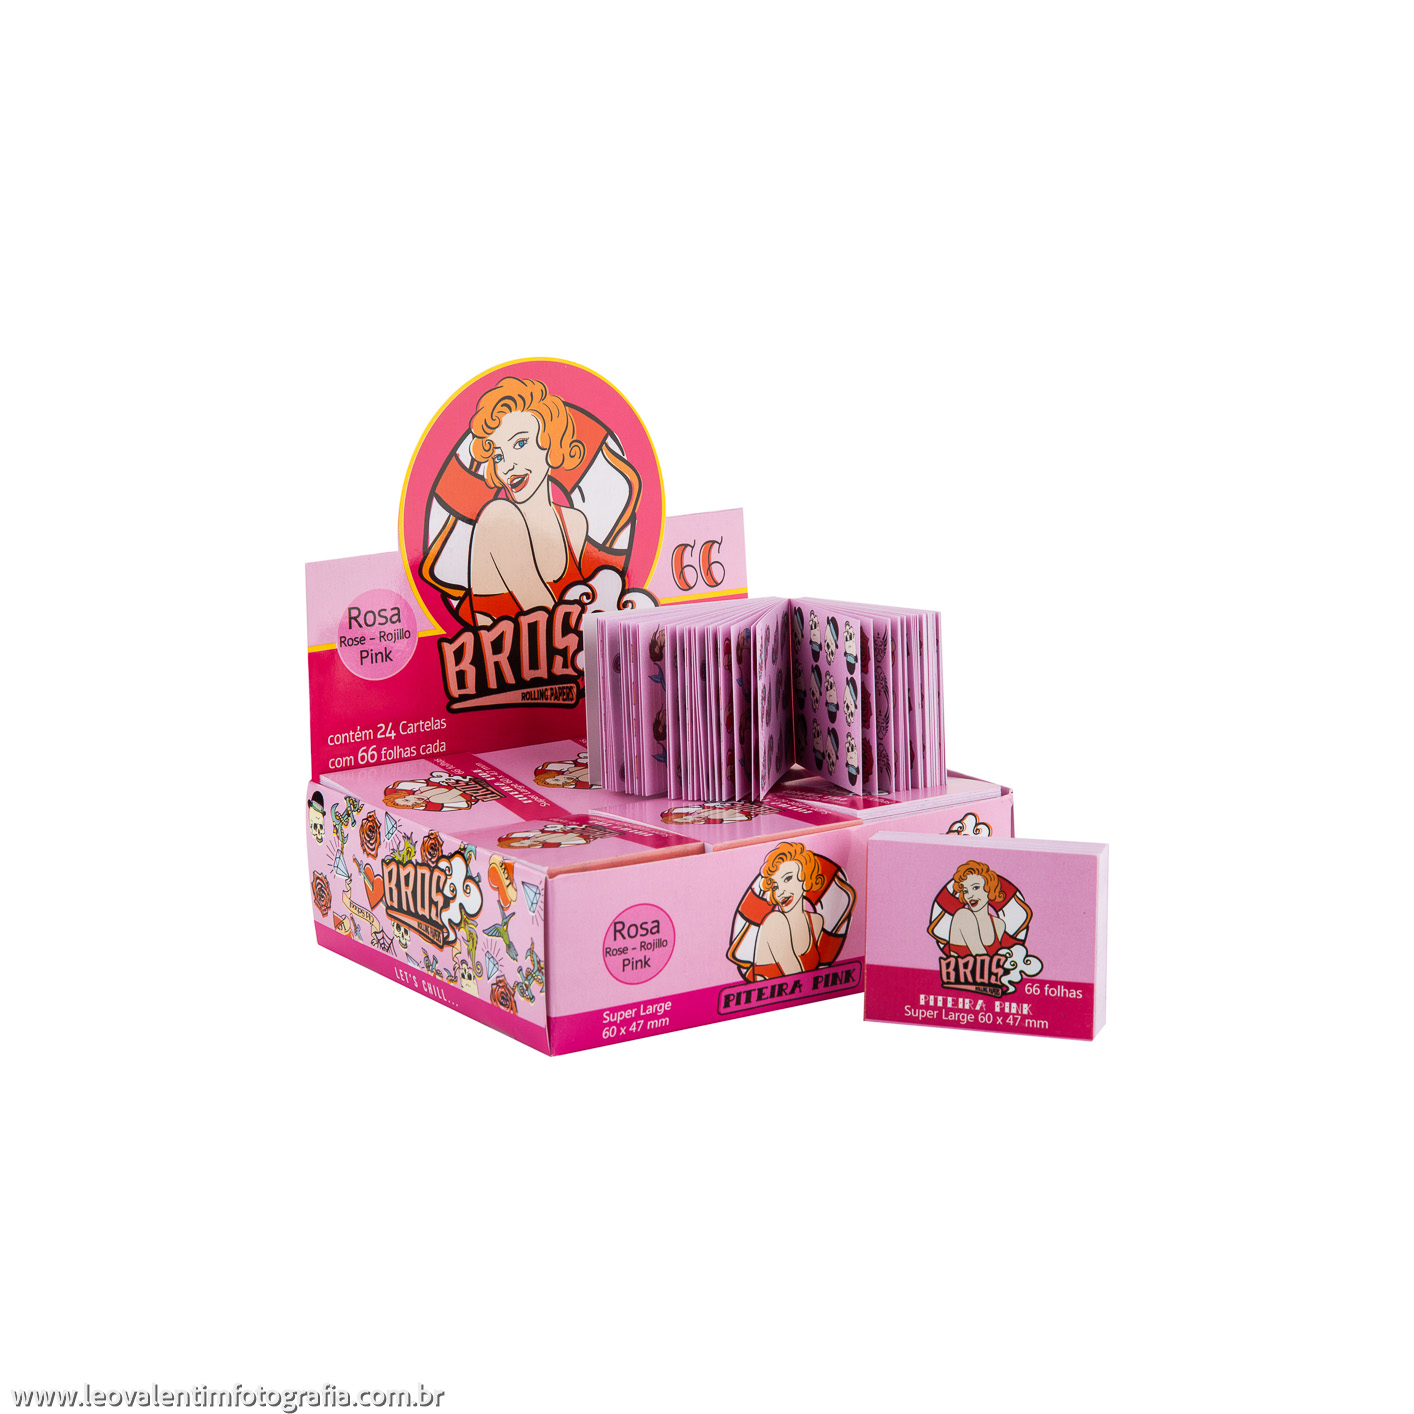 Piteira de Papel Bros Pink Super Large